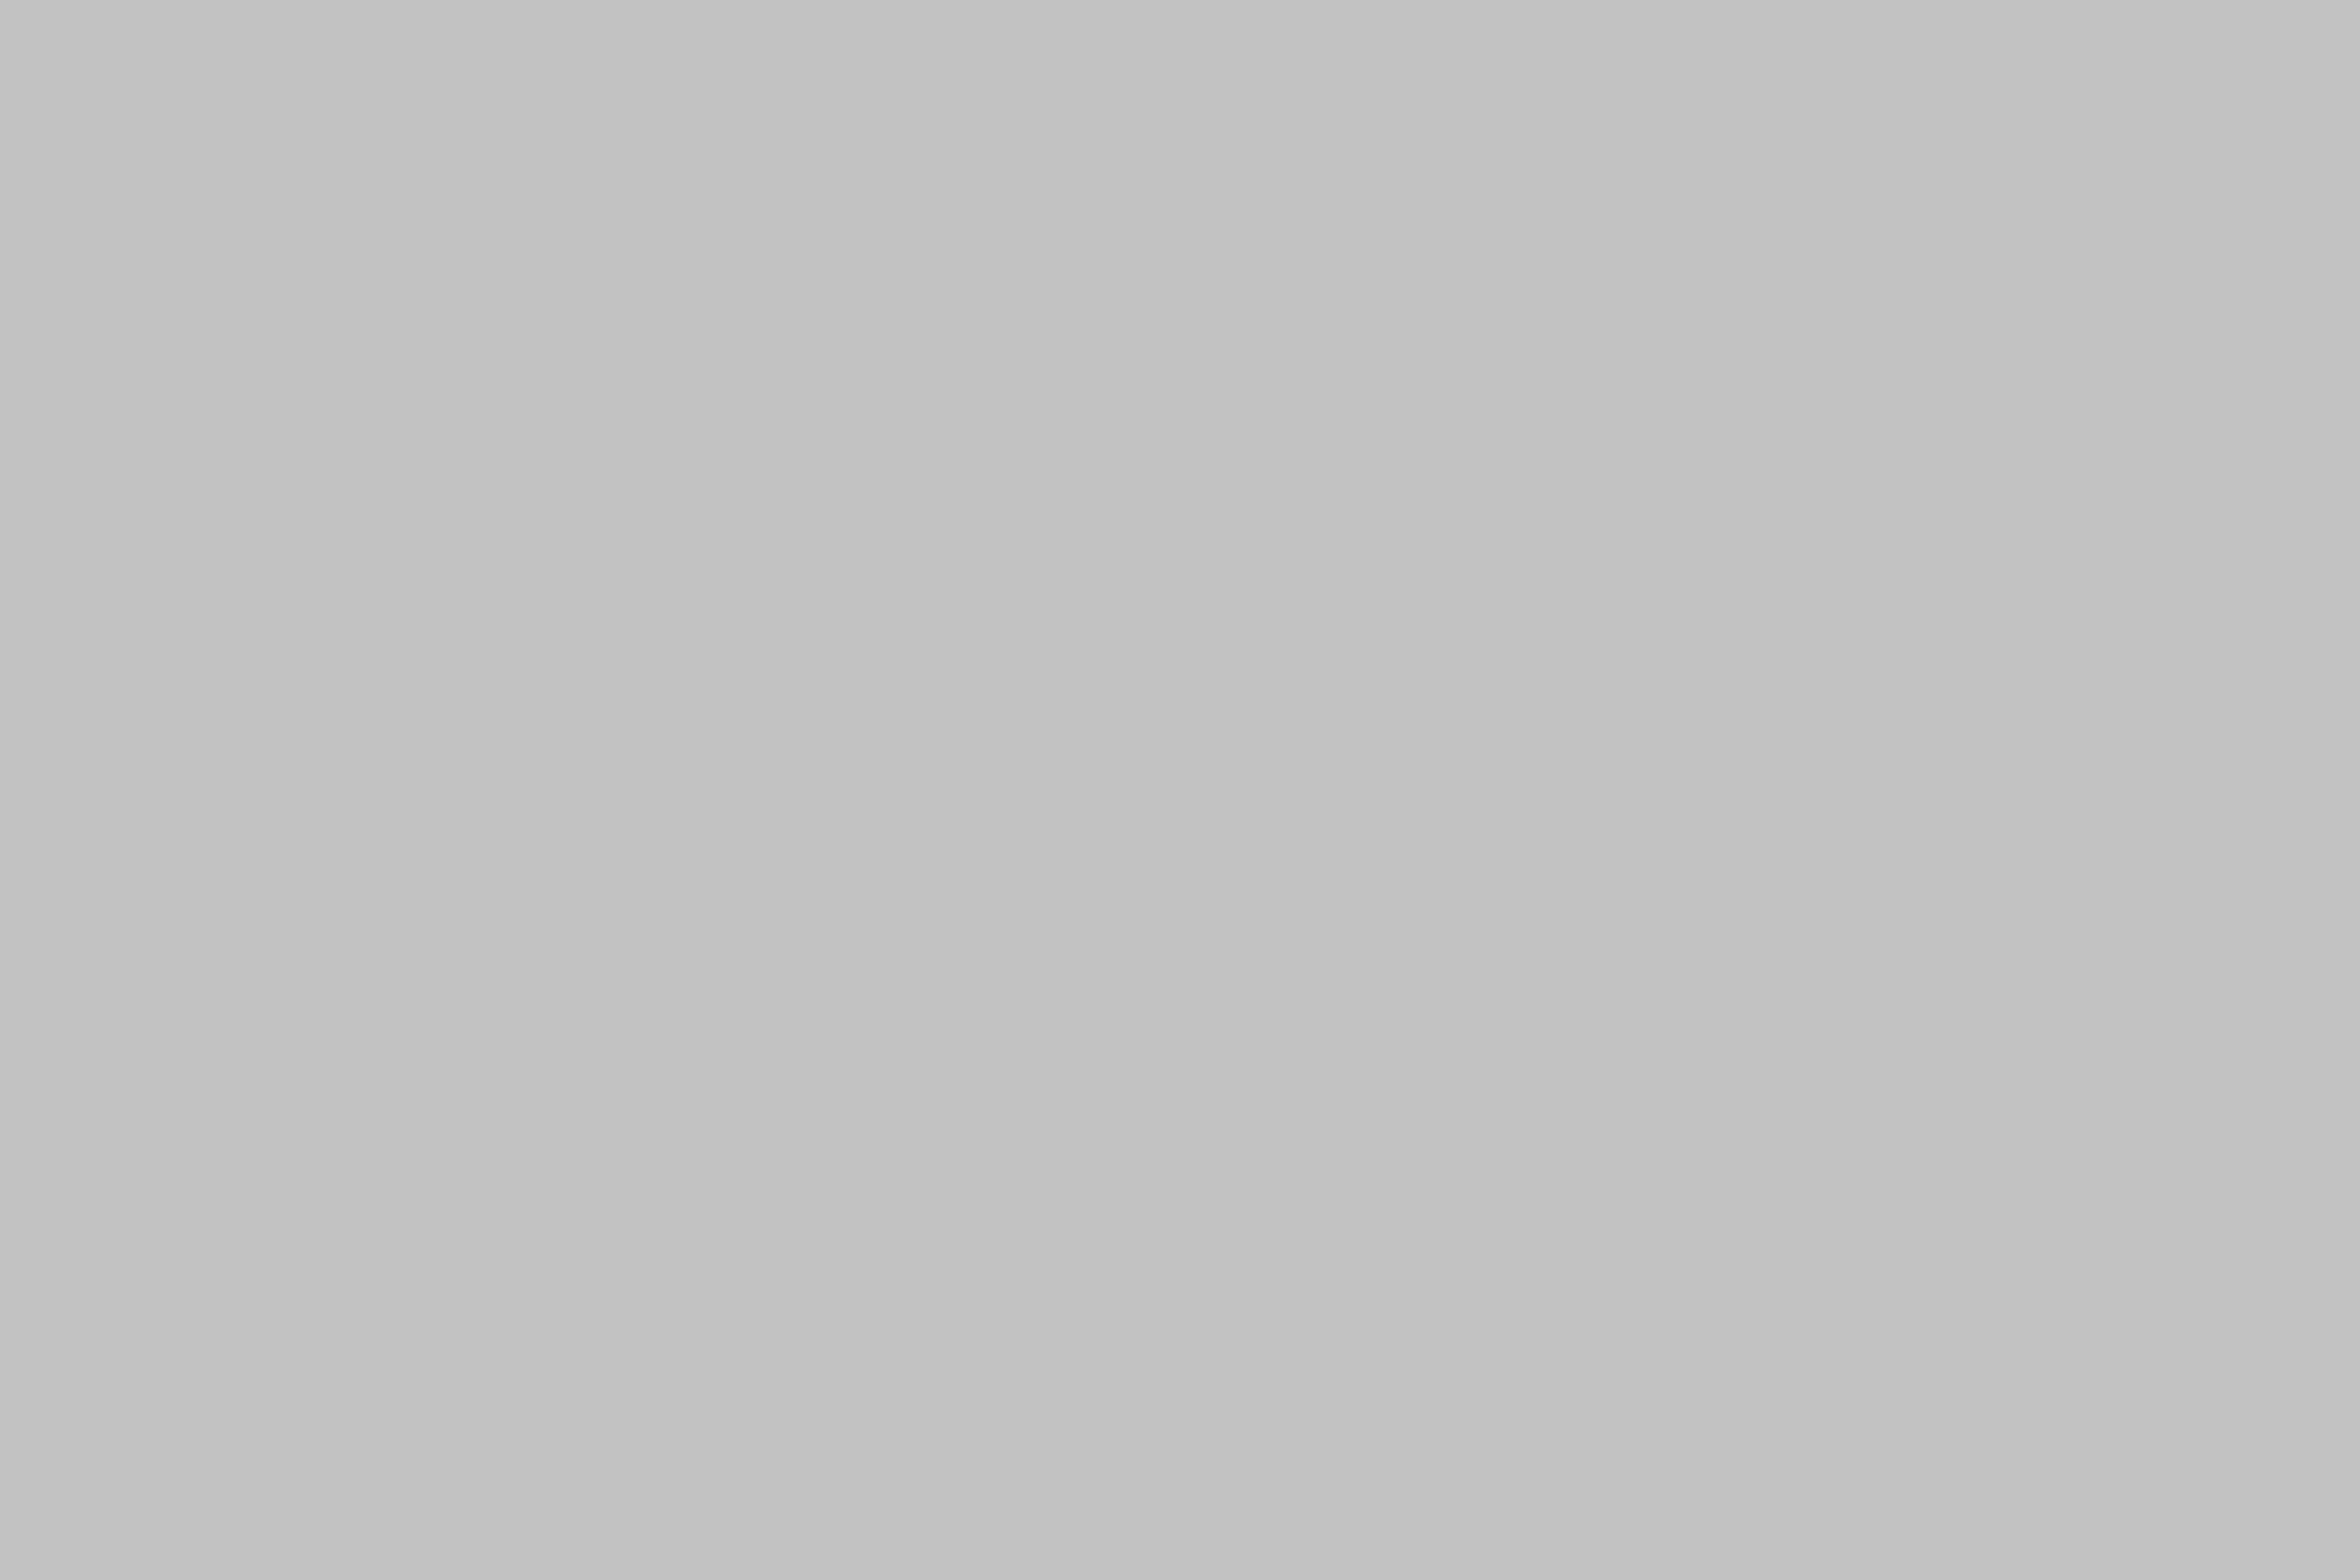 SquareSpace-SermonSeries-Empty.jpg